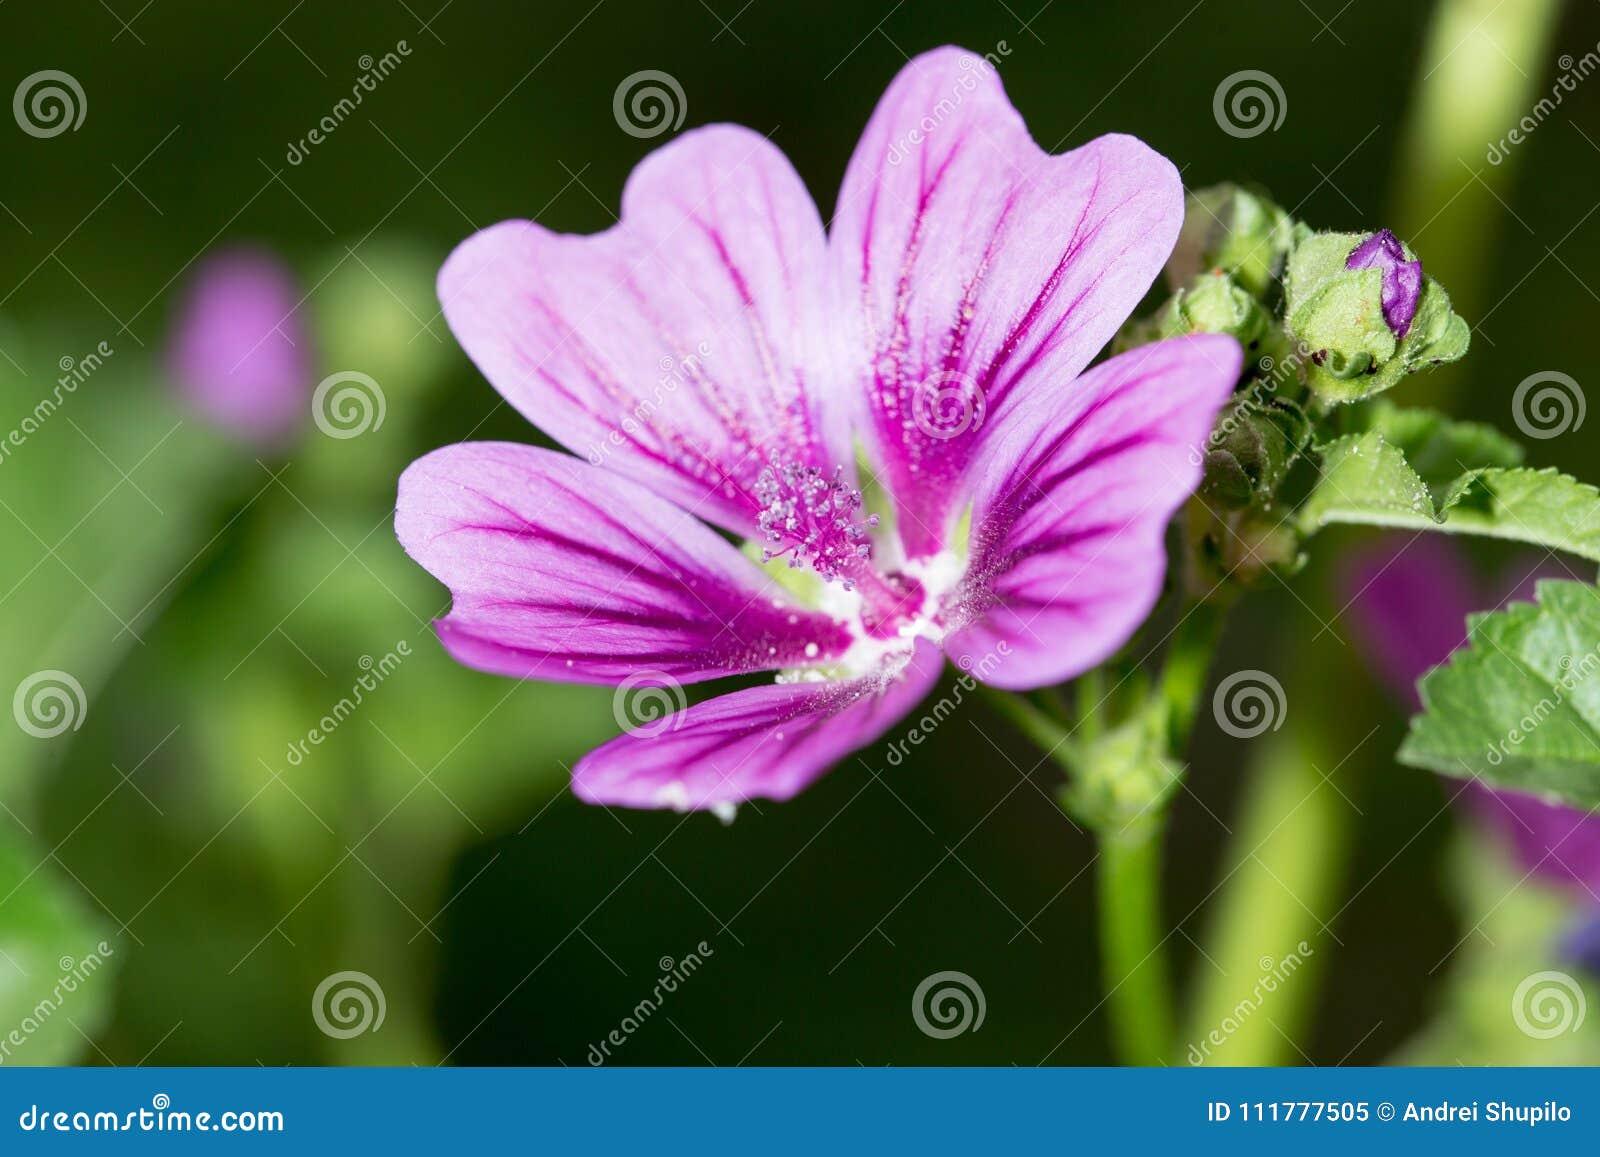 Beautiful purple flower in nature